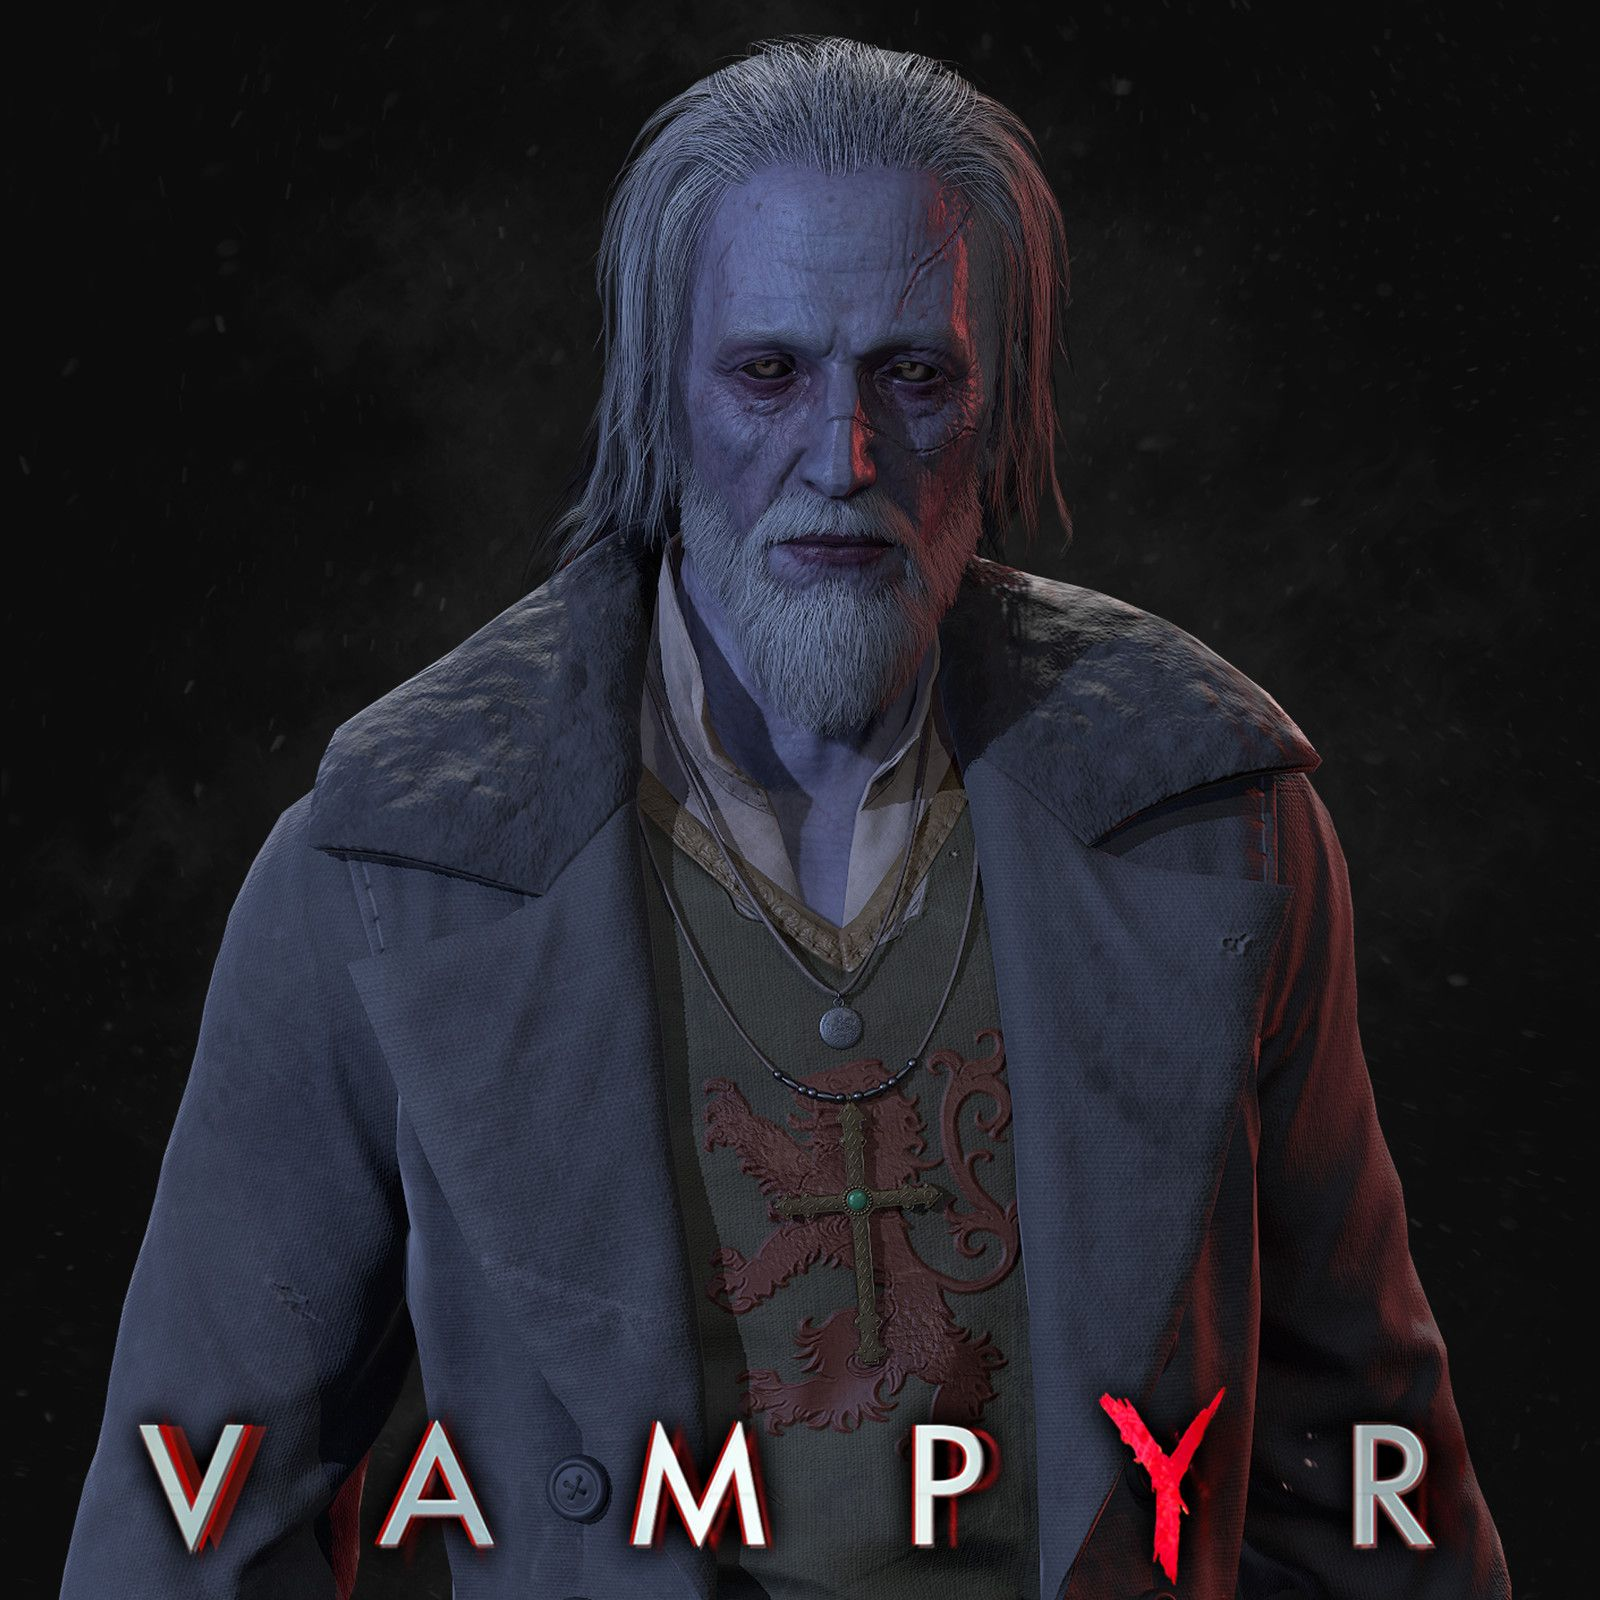 Vampyr william marshal remi luizy on artstation at